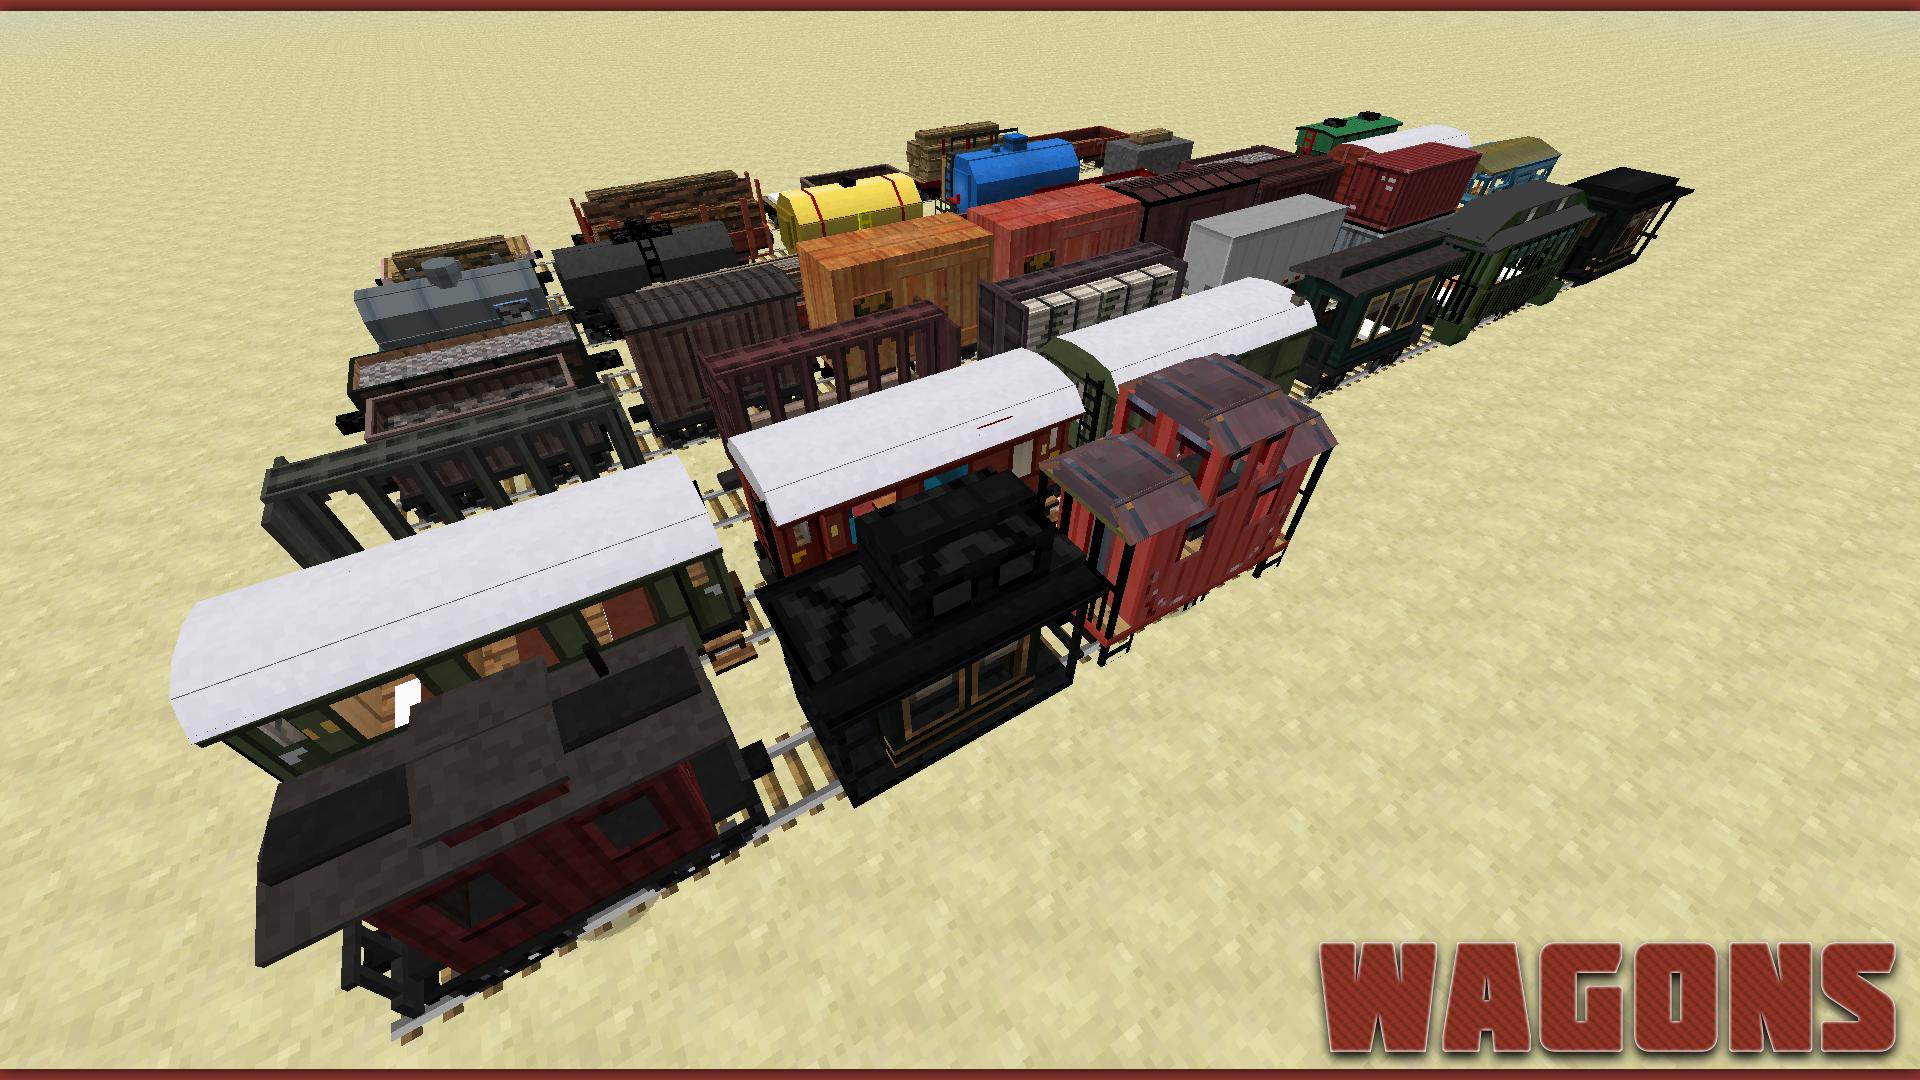 Wagons1